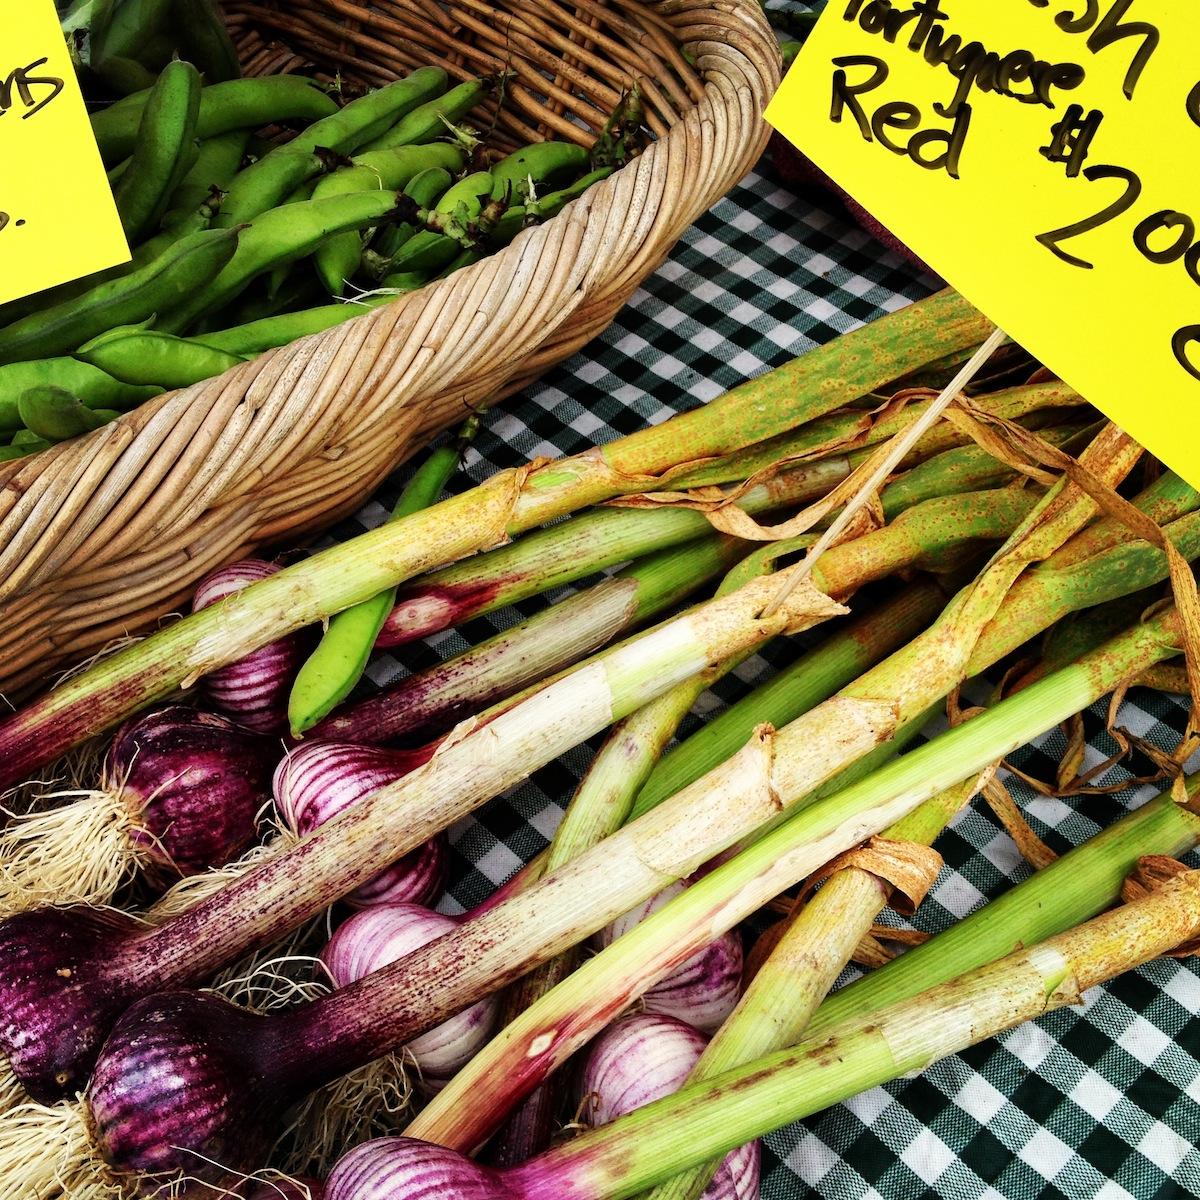 mount-vernon-farmers-market